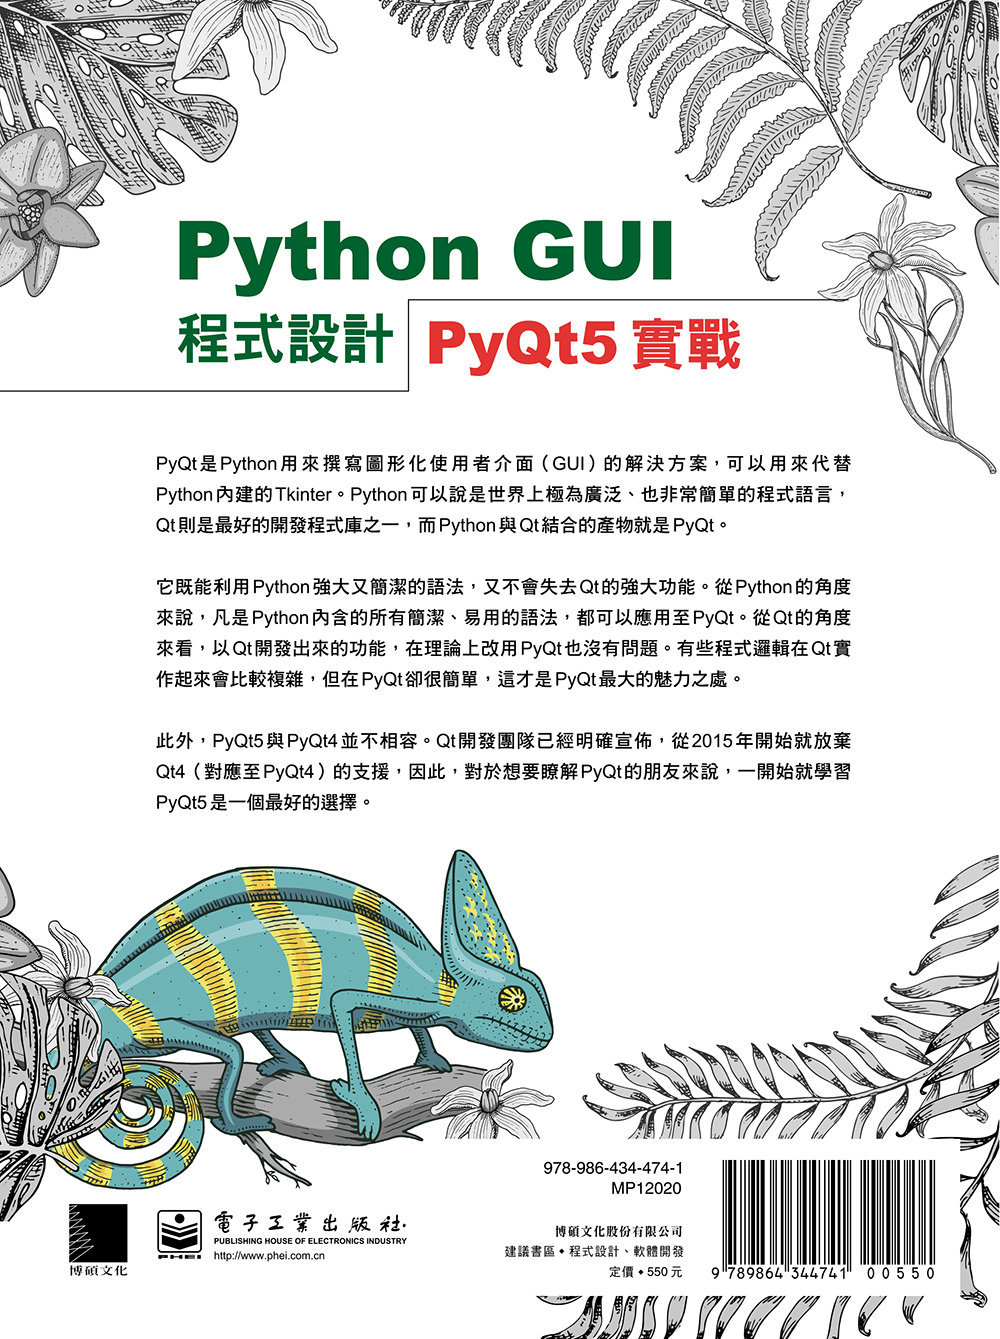 Python GUI 程式設計:PyQt5 實戰 (暢銷回饋版)-preview-16